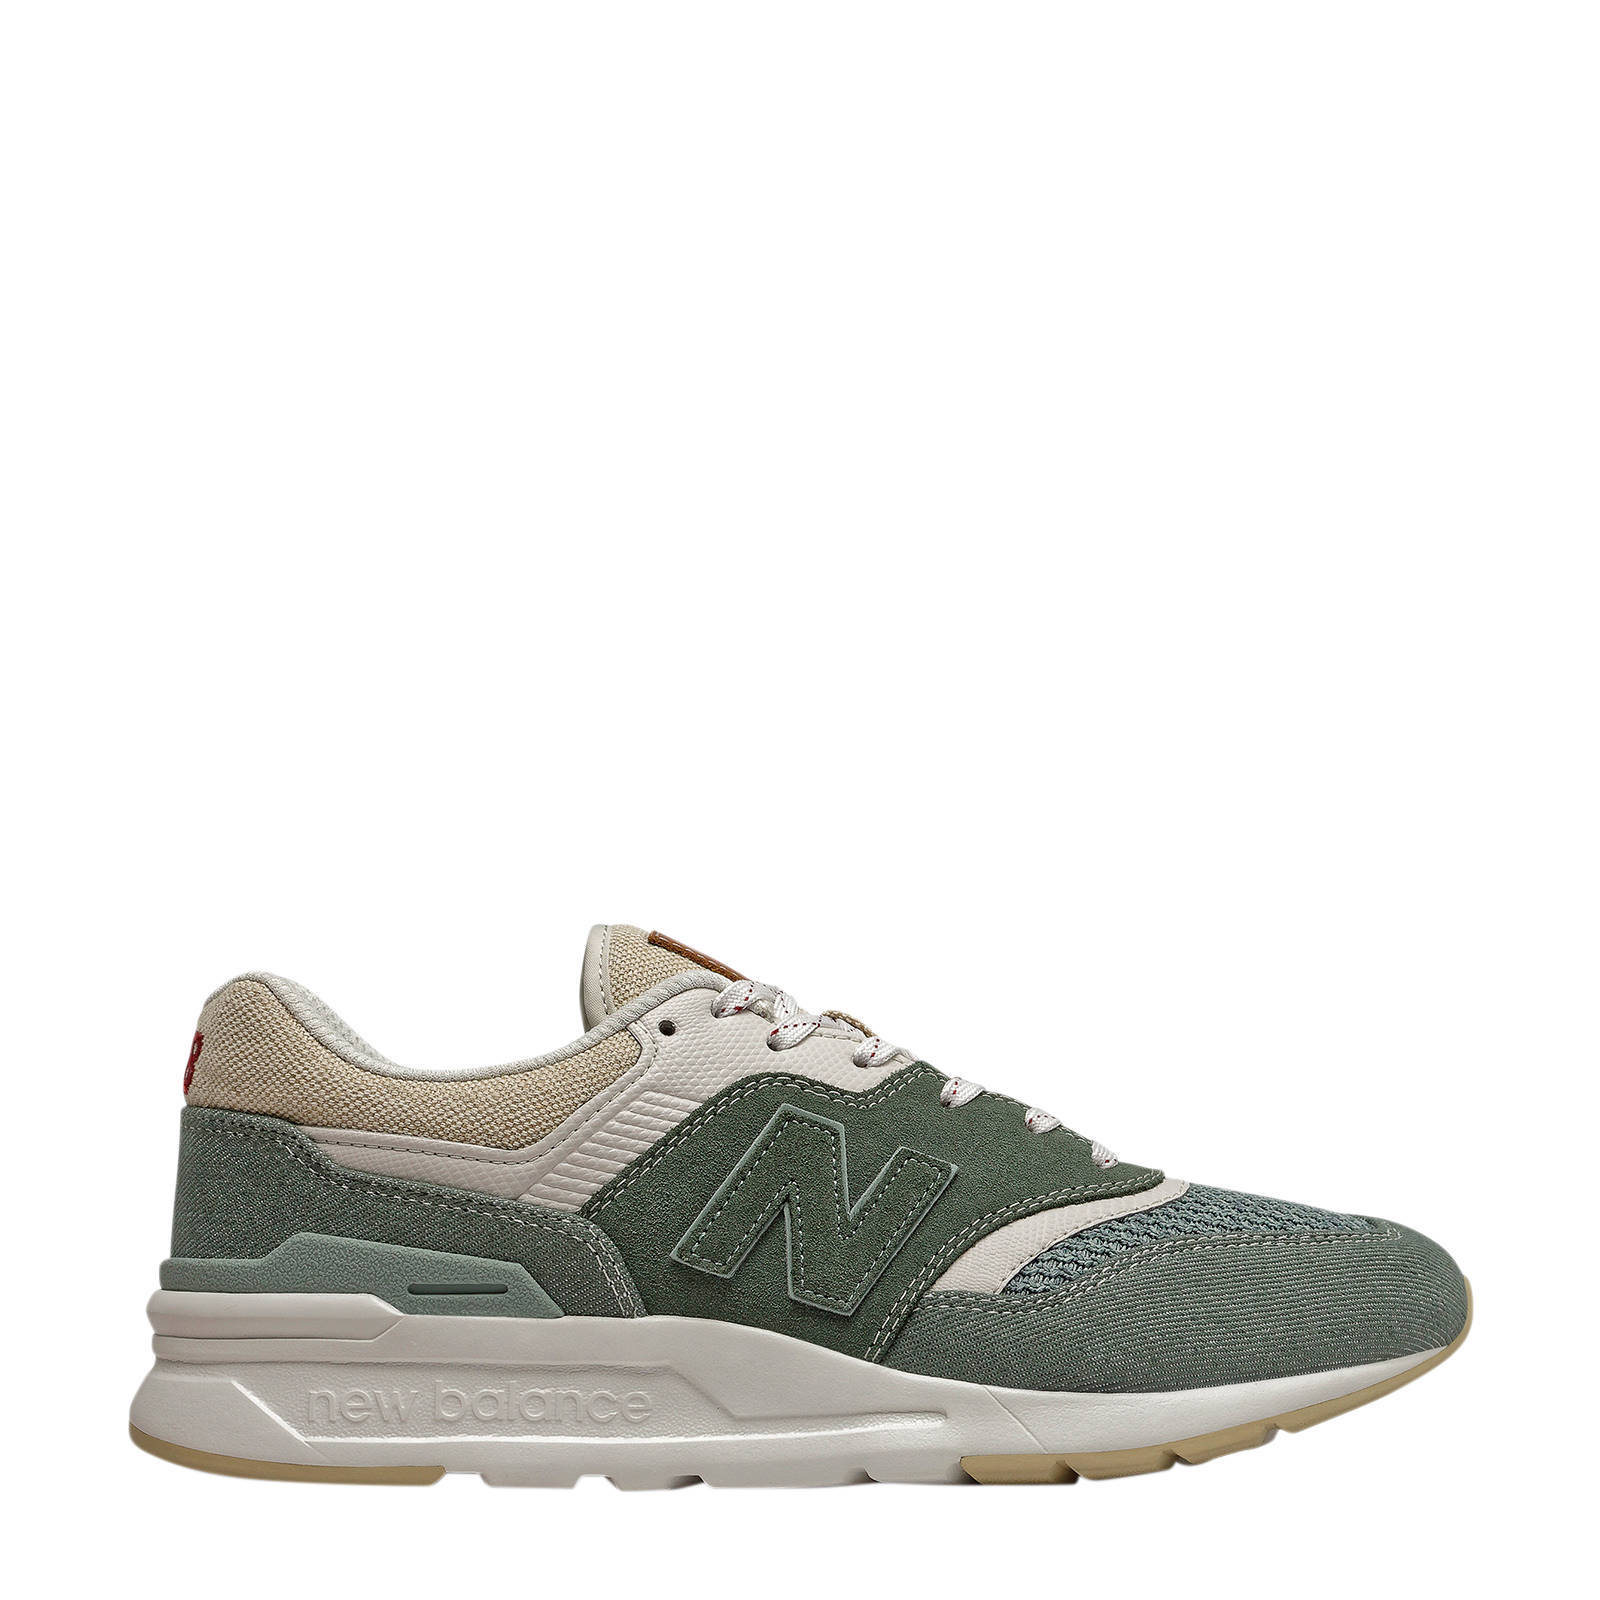 New Balance 997H sneakers kaki/beige | wehkamp